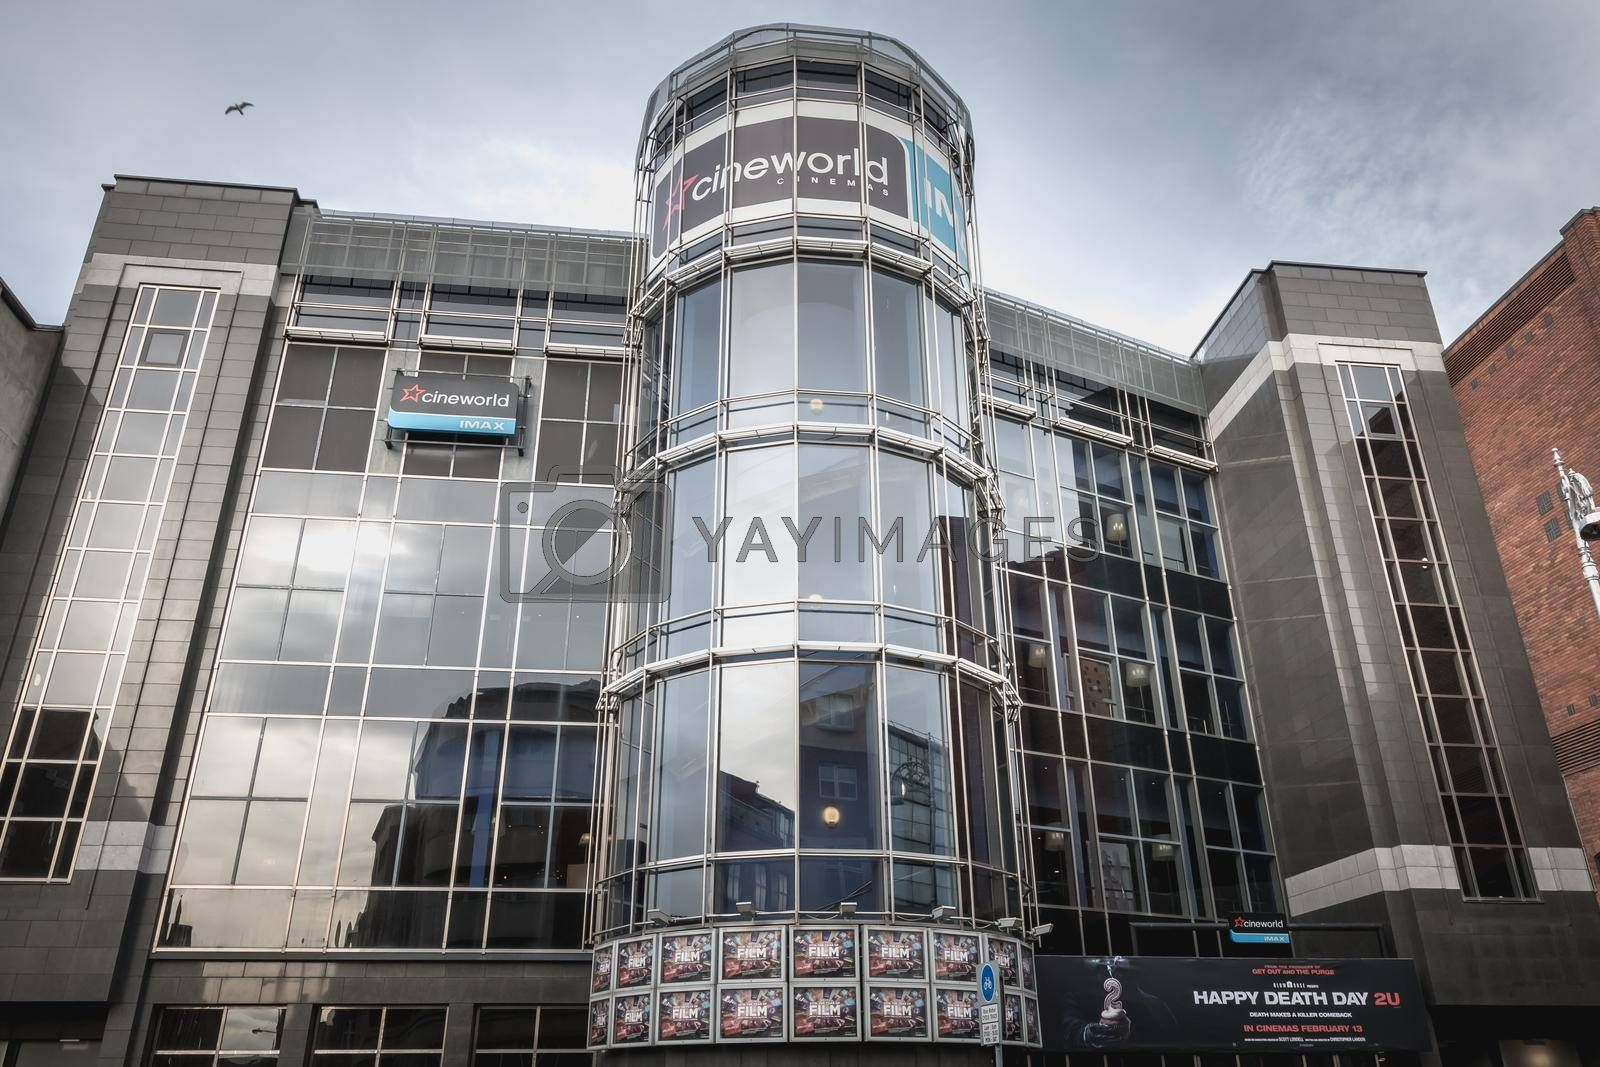 Dublin, Ireland, February 12, 2019: facade of Cineworld Complex in Dublin city center on a winter day